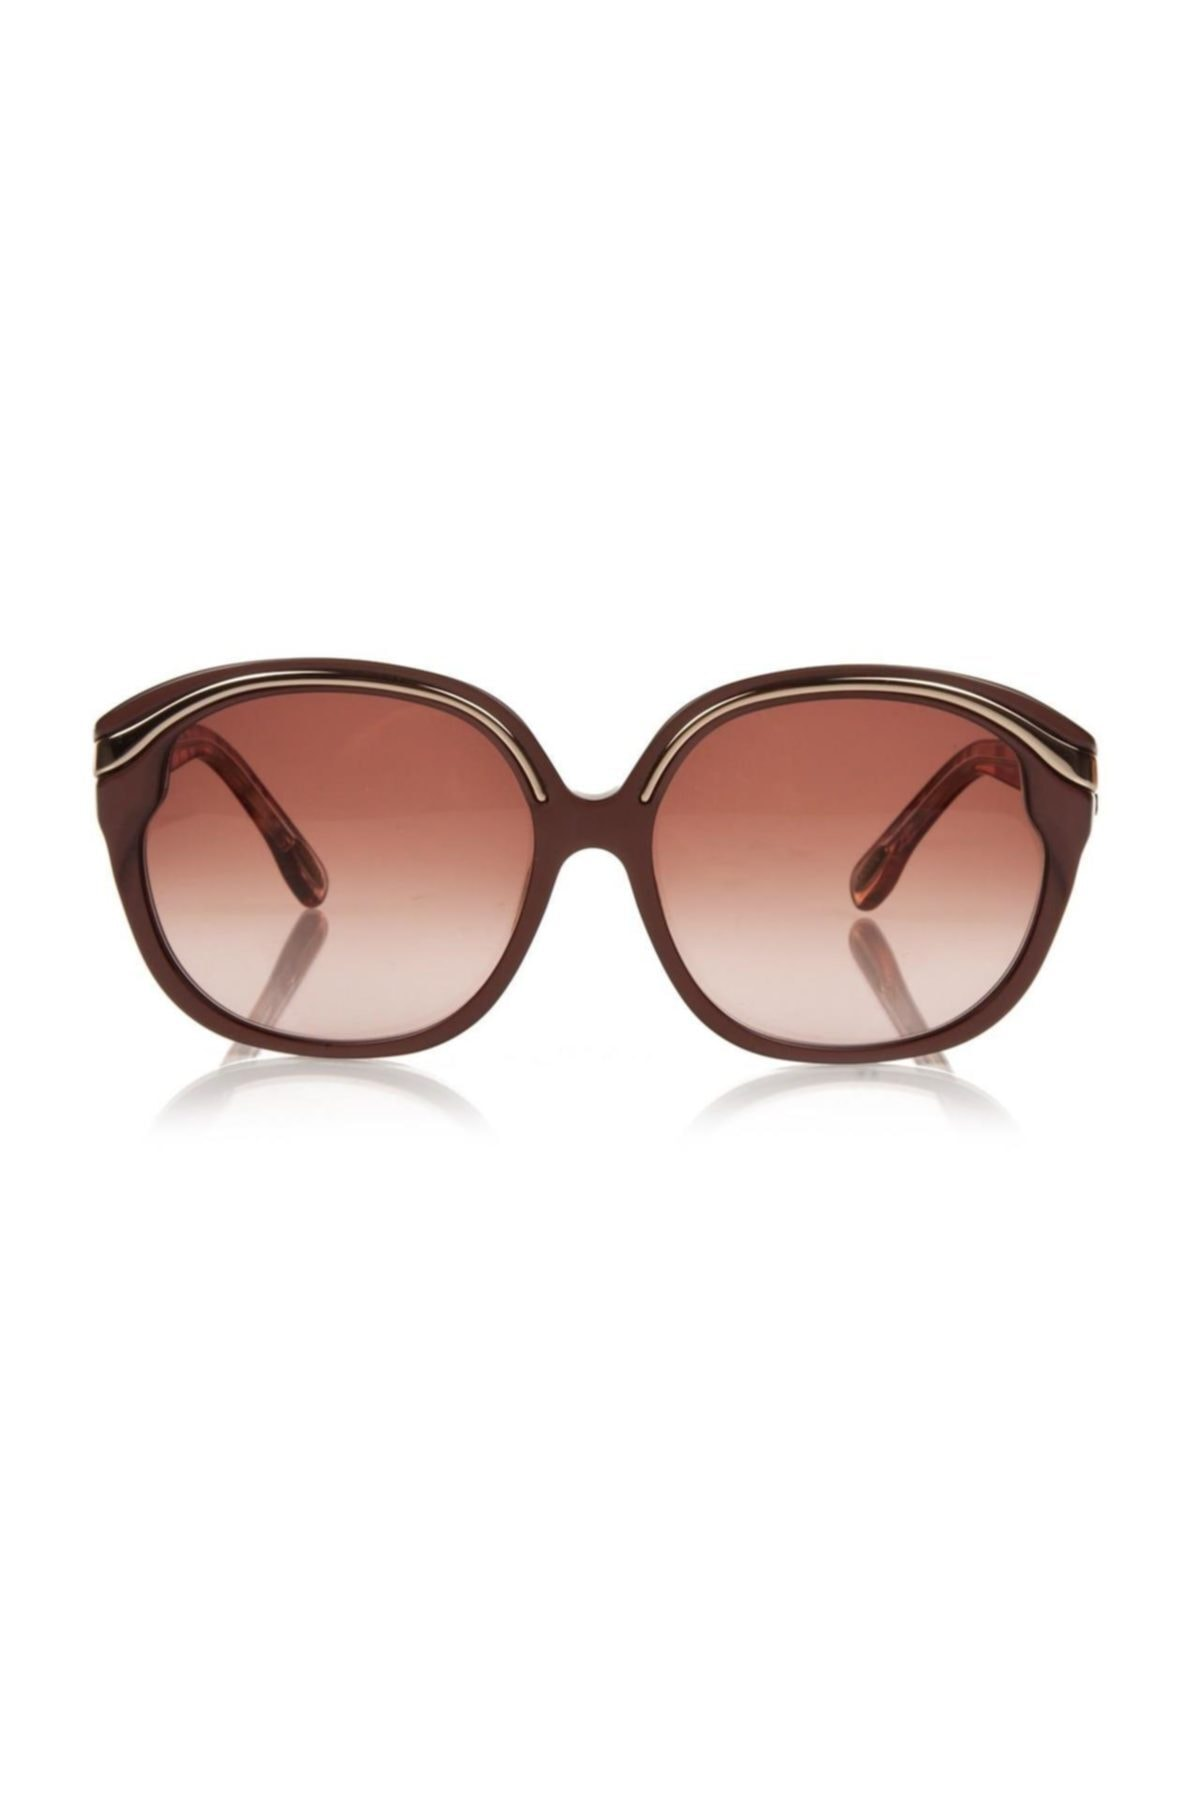 Emilio Pucci Kadın Dikdörtgen Güneş Gözlüğü Ep 689 210 1